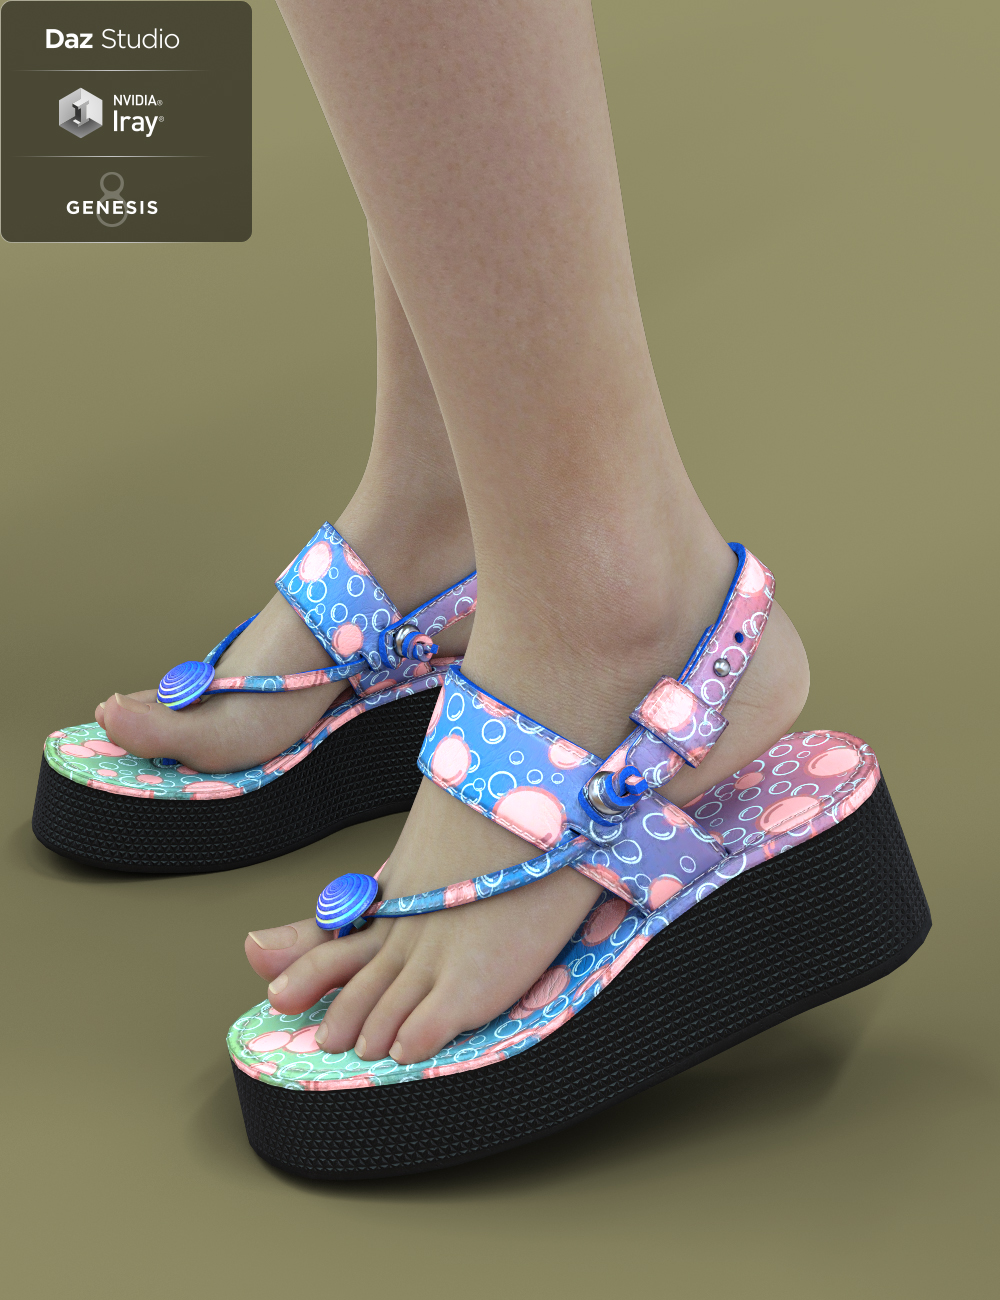 Jiwoo Sandals for Genesis 8 Female(s) by: chungdan, 3D Models by Daz 3D